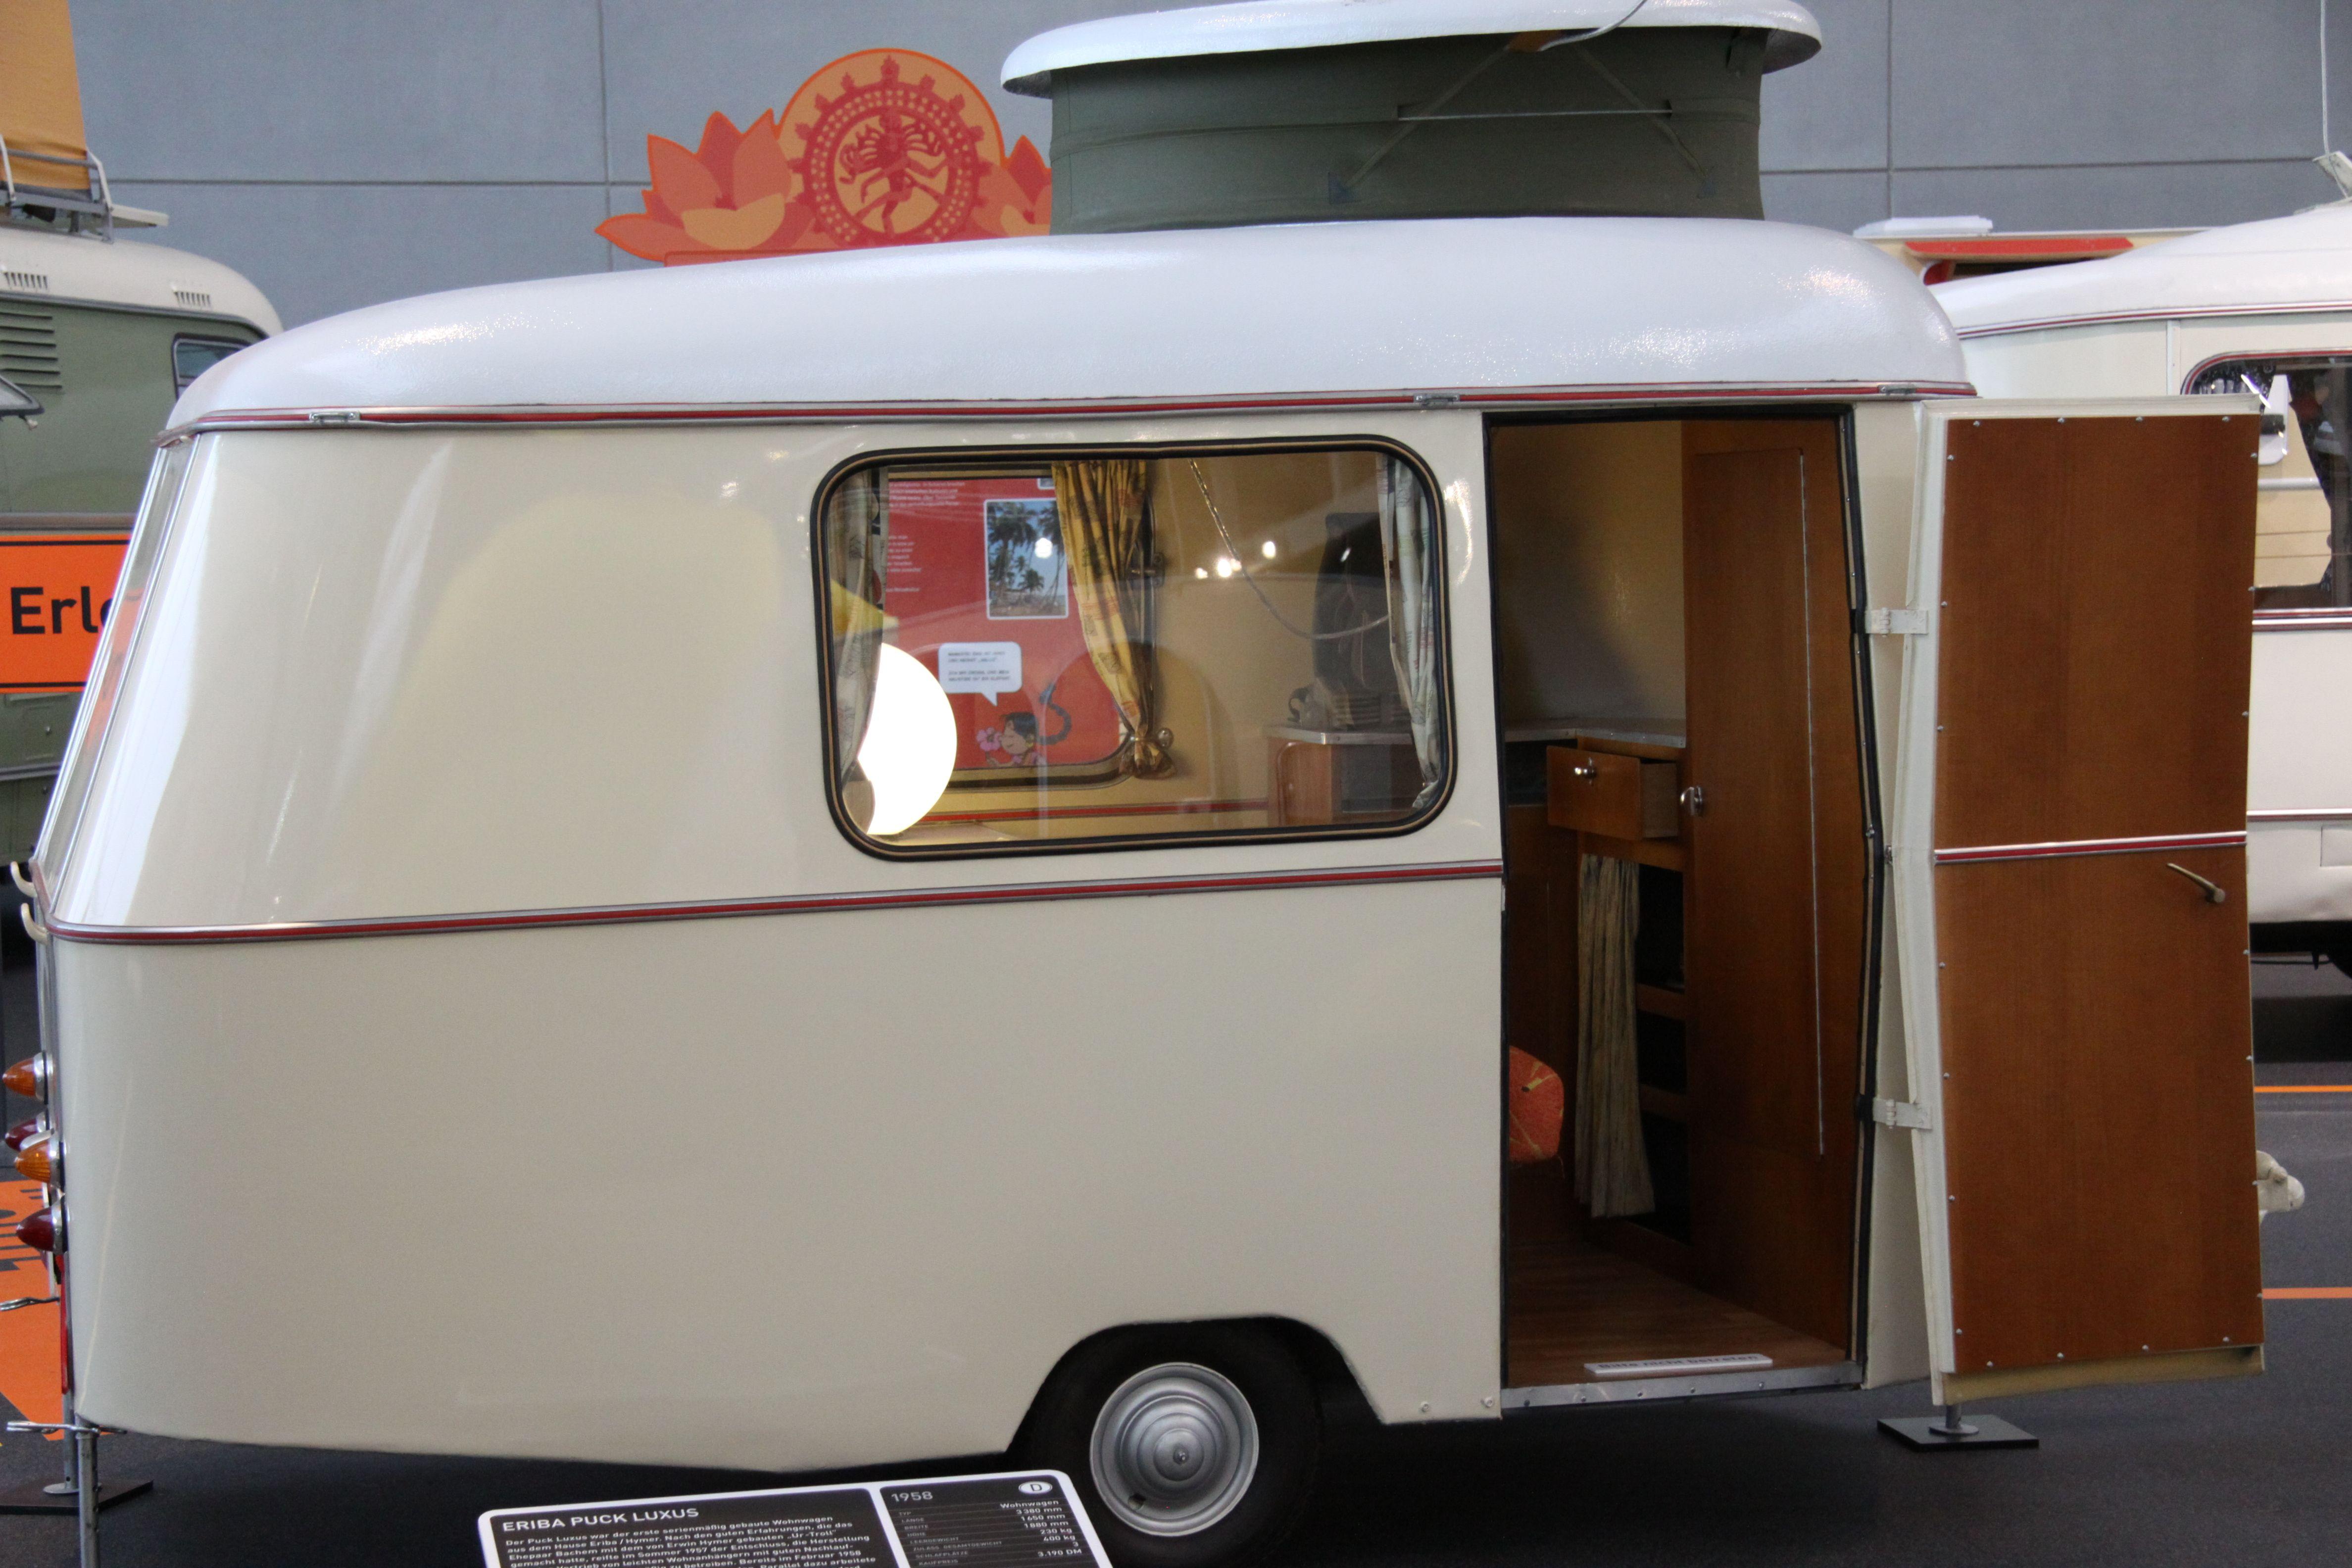 eriba puck im hymer museum vintage oldtimer wohnwagen pinterest. Black Bedroom Furniture Sets. Home Design Ideas